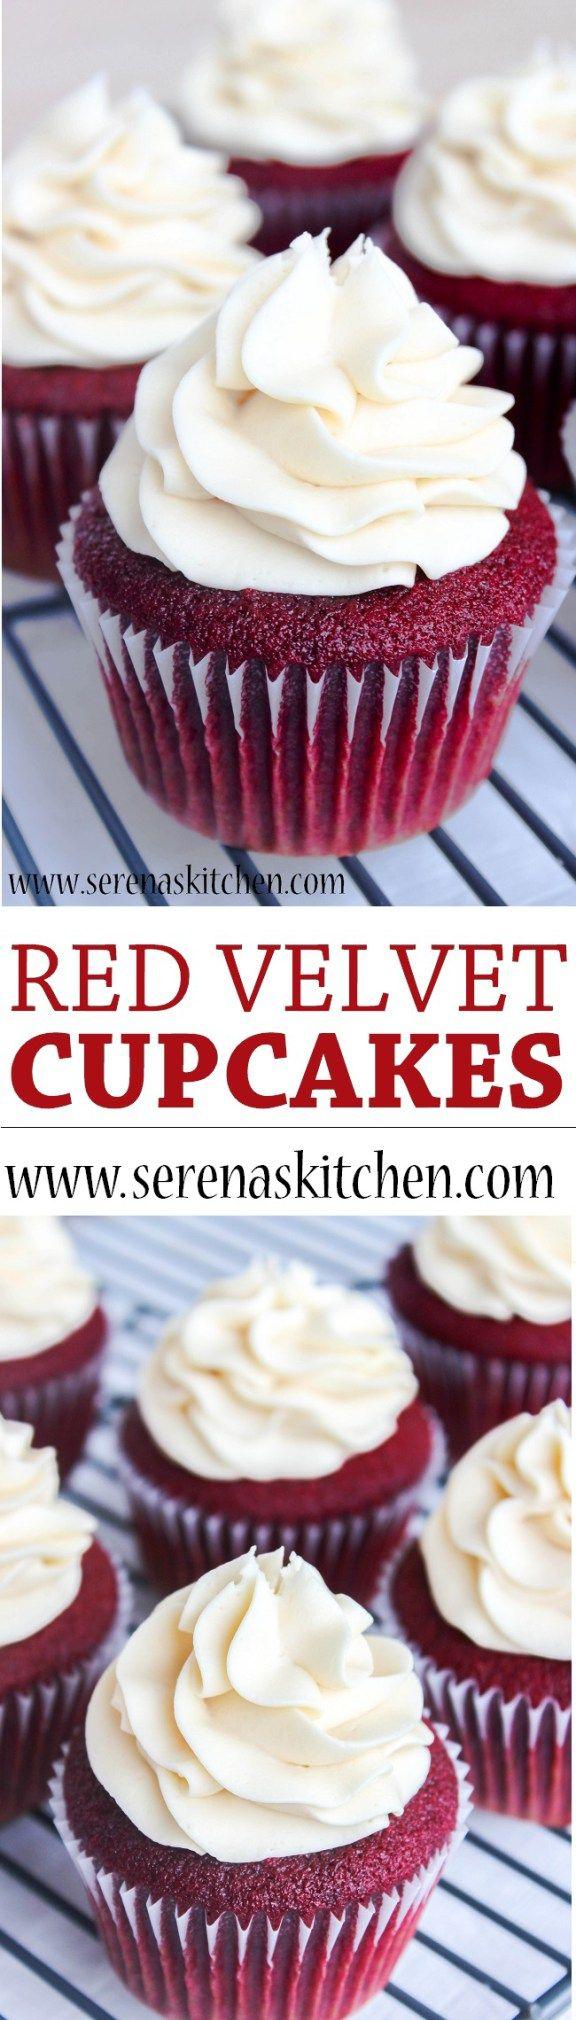 Red Velvet Cupcakes via serenaskitchen.com #redvelvet #cupcakes